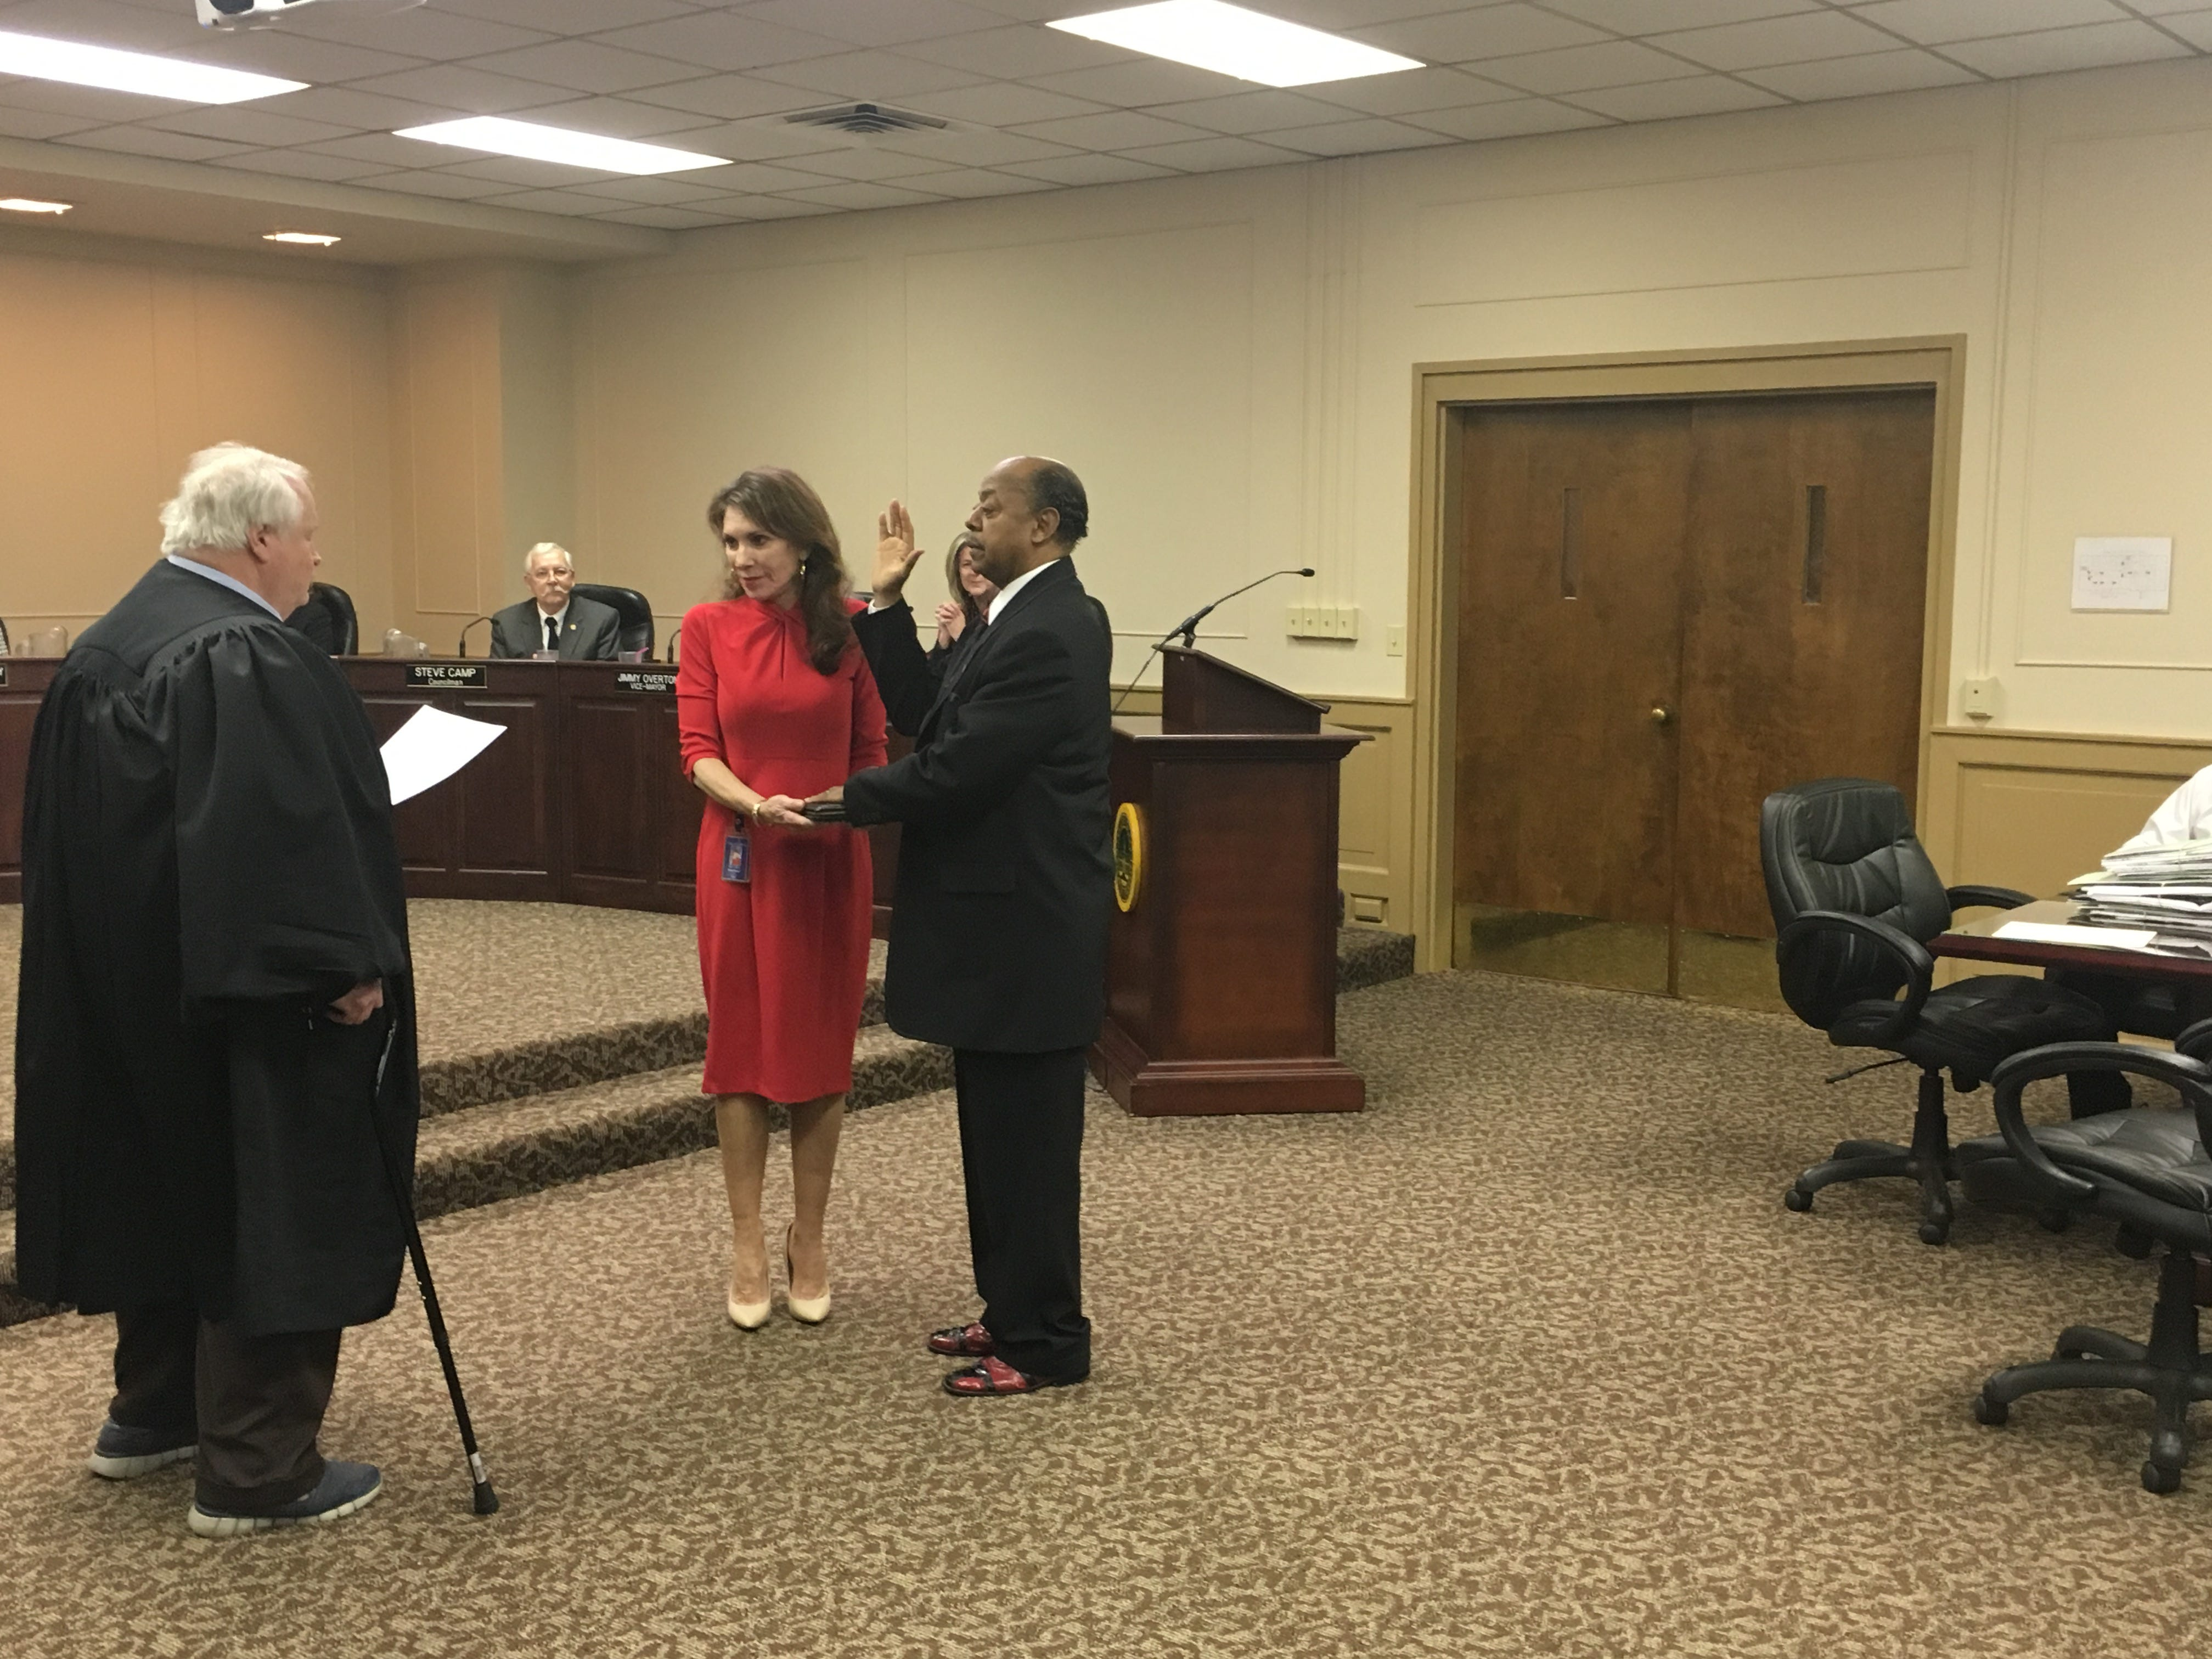 Re-elected John Alexander is sworn in as  District 5 Councilman on Jan. .15, 2019.